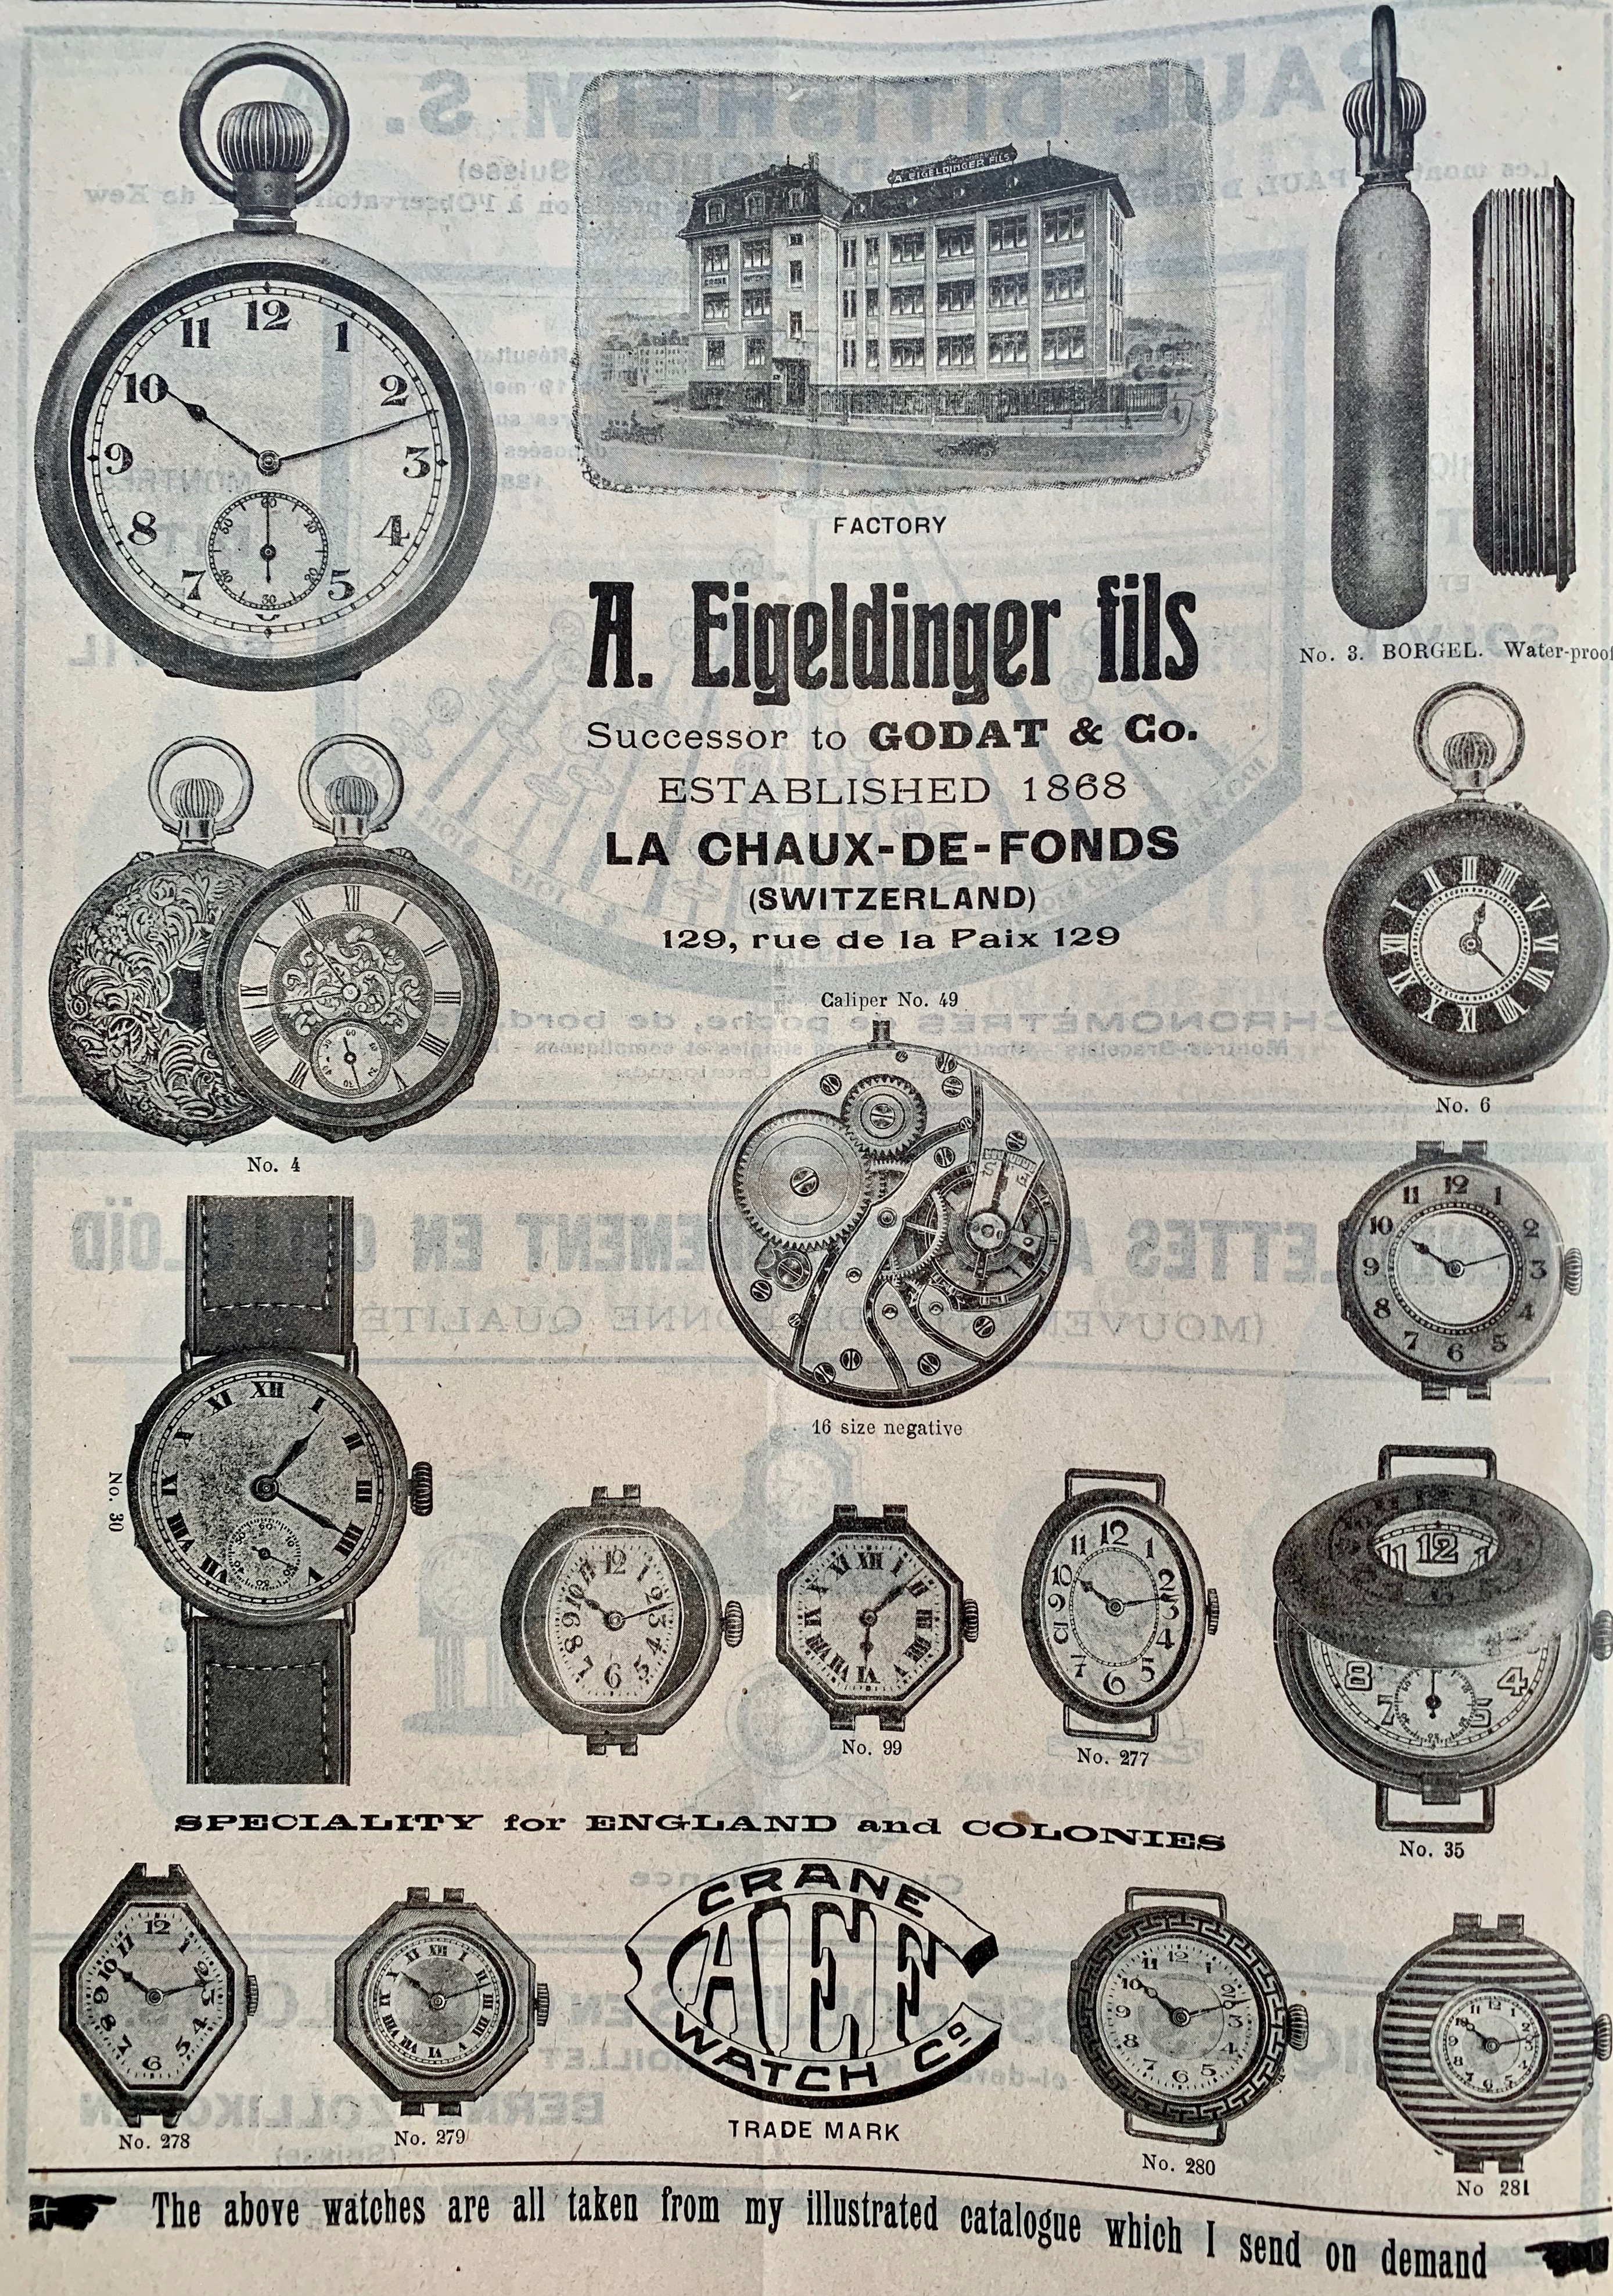 1920 Eigeldinger_fils_Godat_la_chaux_de_fonds1920